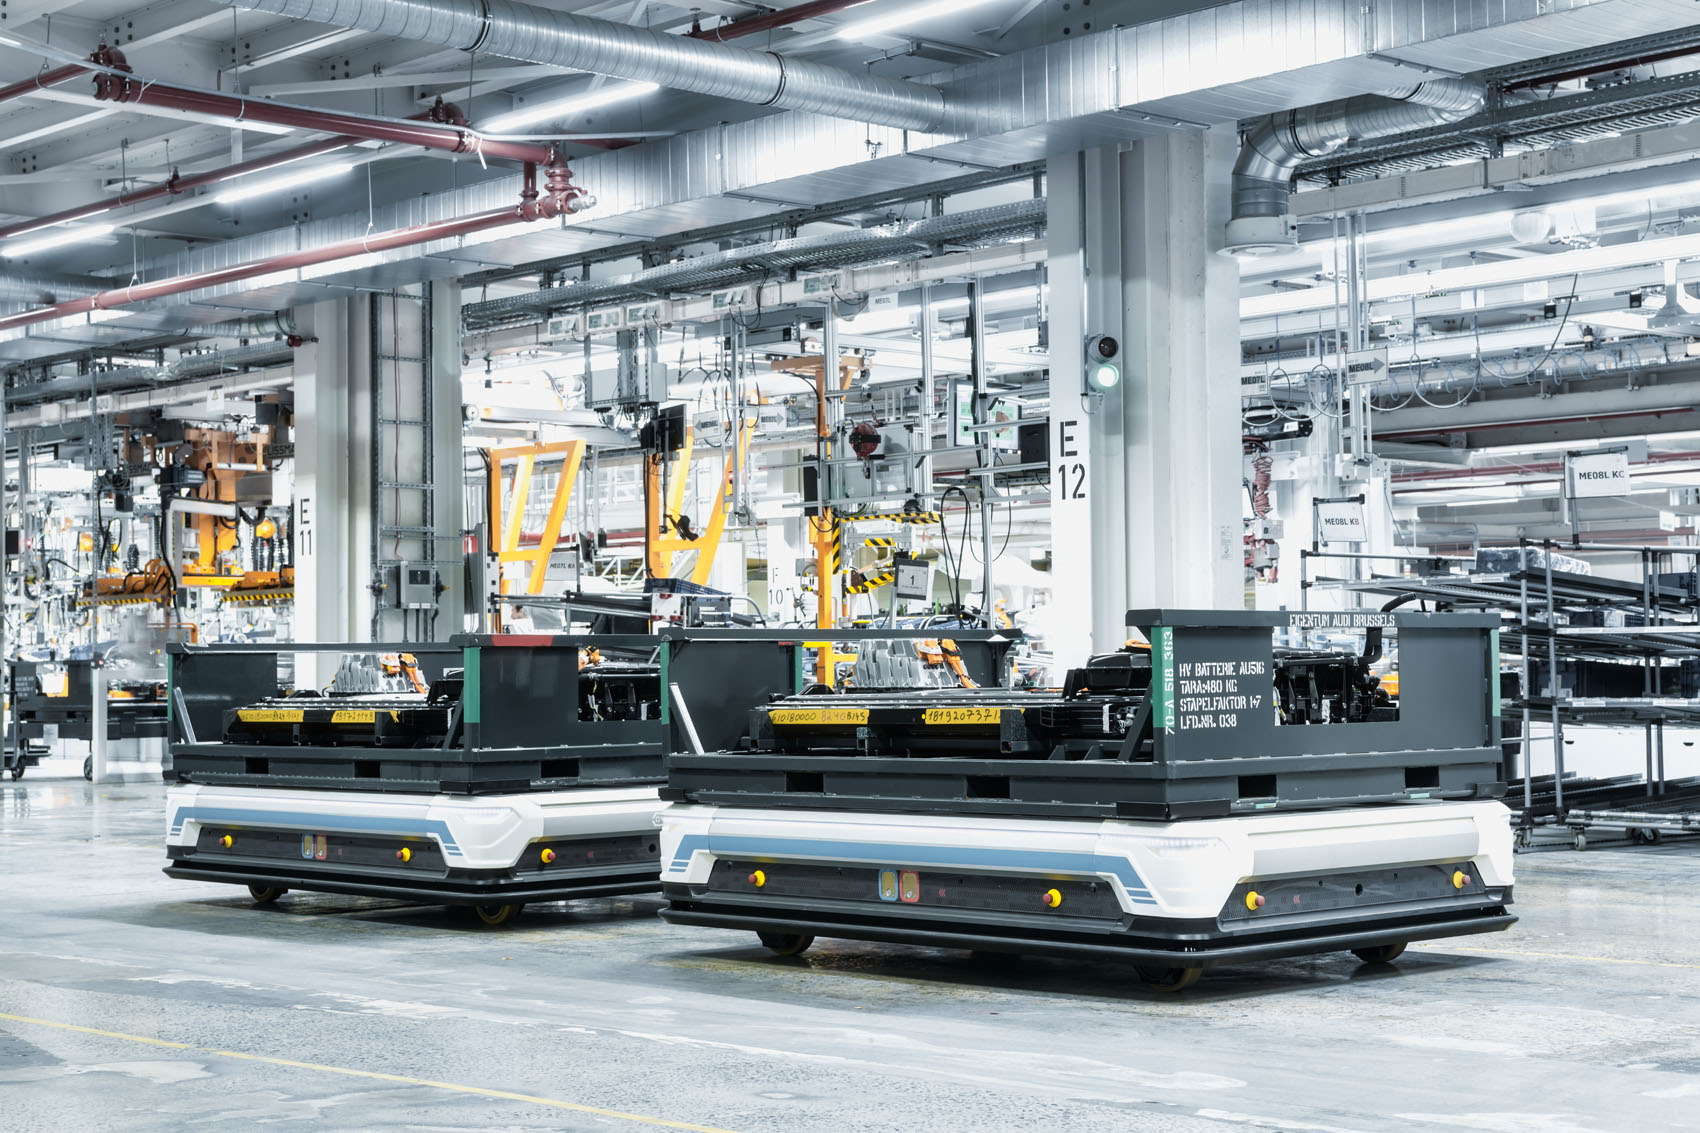 Batterie-Chauffeure: Fahrerlose Transportsysteme (FTS) übernehmen die Anlieferung der Batterie ans Band. (Stefan Warter)